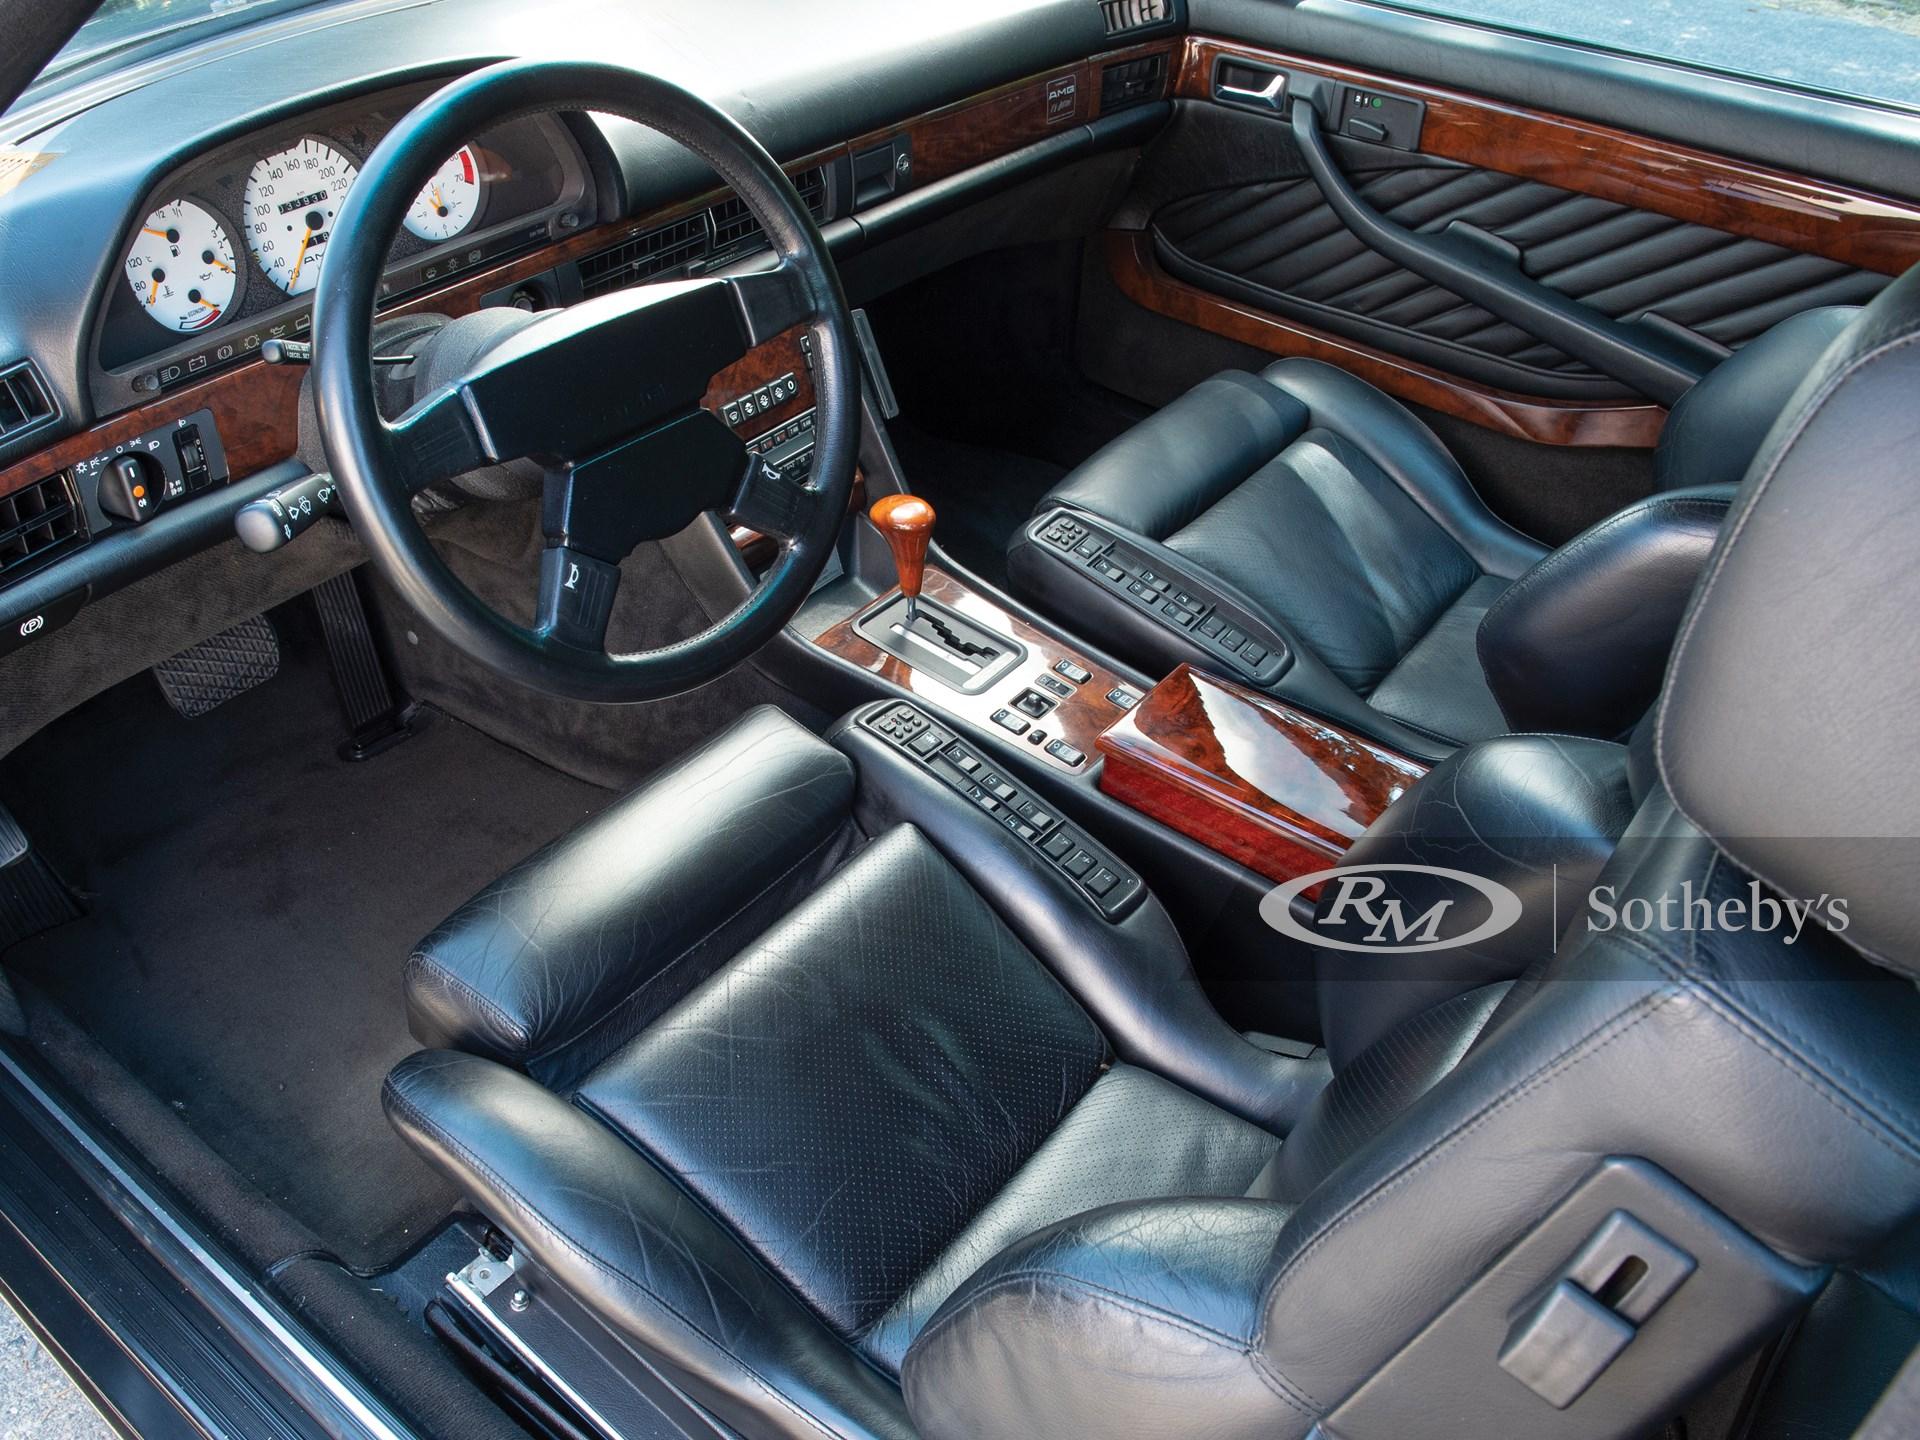 1991 Mercedes-Benz 560 SEC AMG 6.0 'Wide-Body'  -